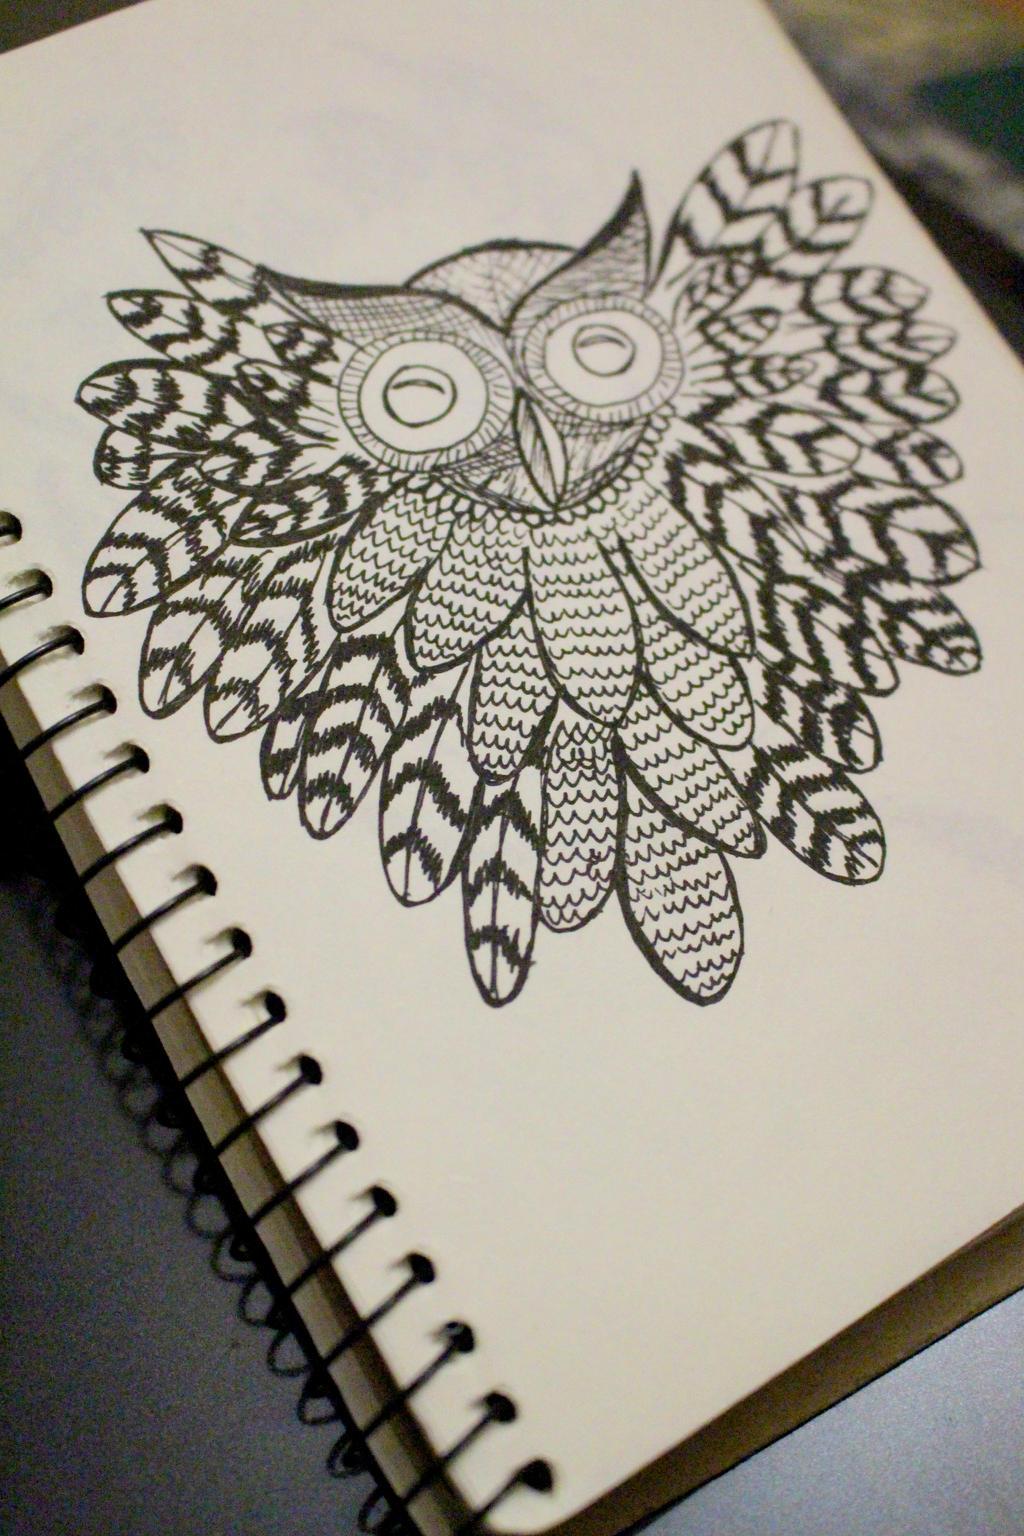 An ooowwwl by Margoshkagrs